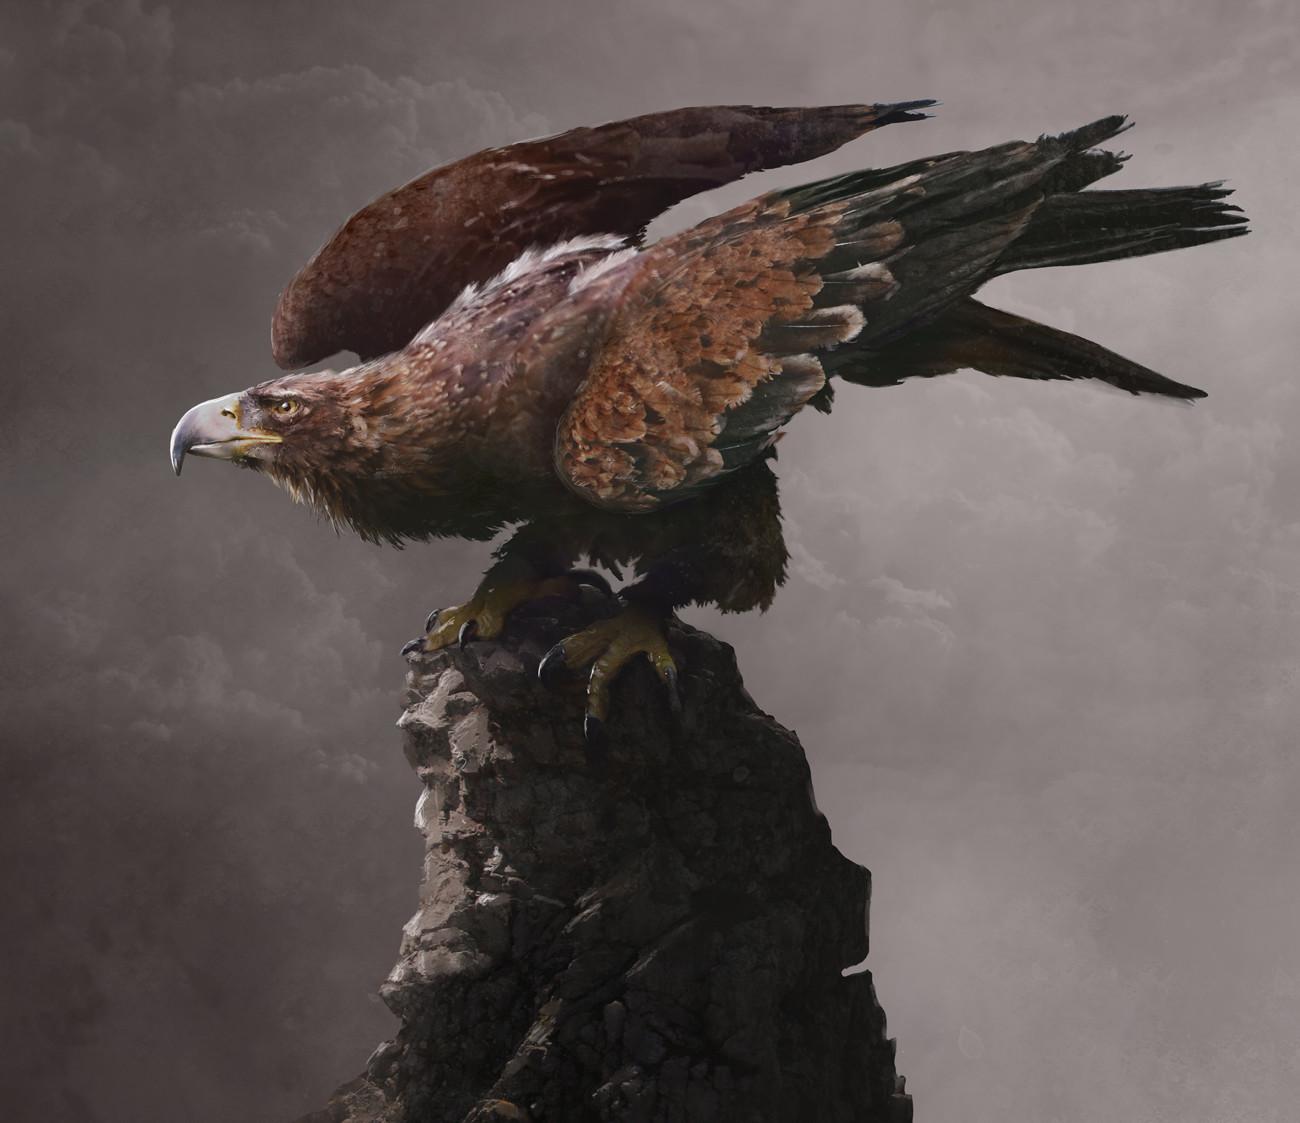 Guillem h pongiluppi 15 mythic battles caucasuian eagle